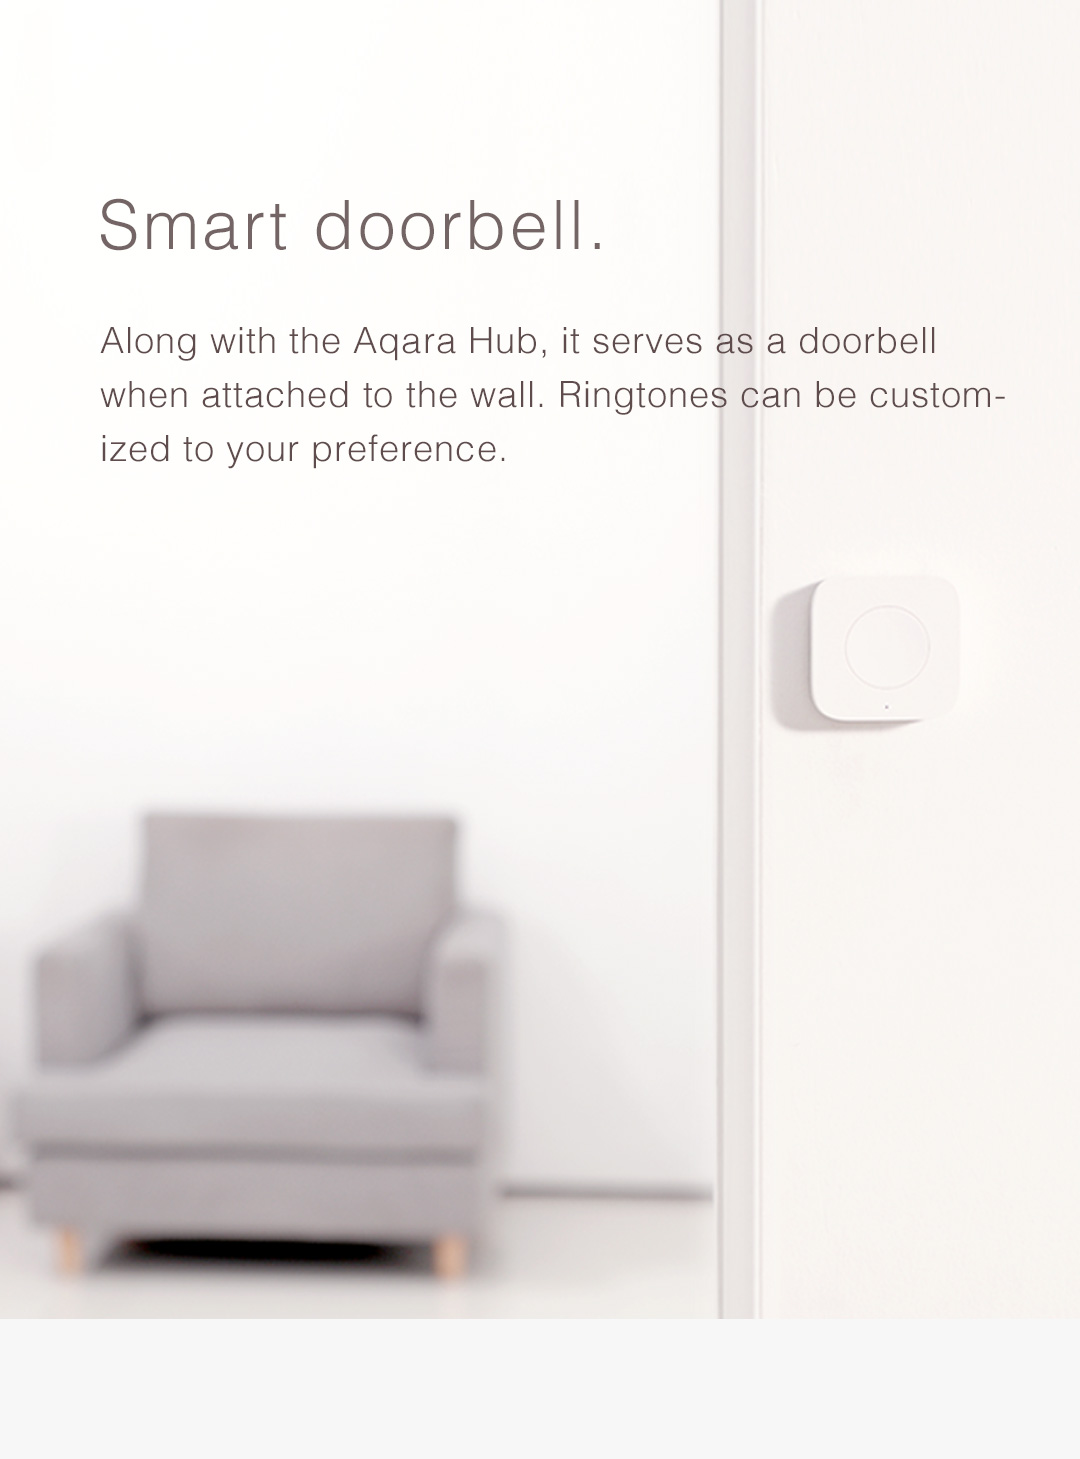 Wireless switch as doorbell or emergency button